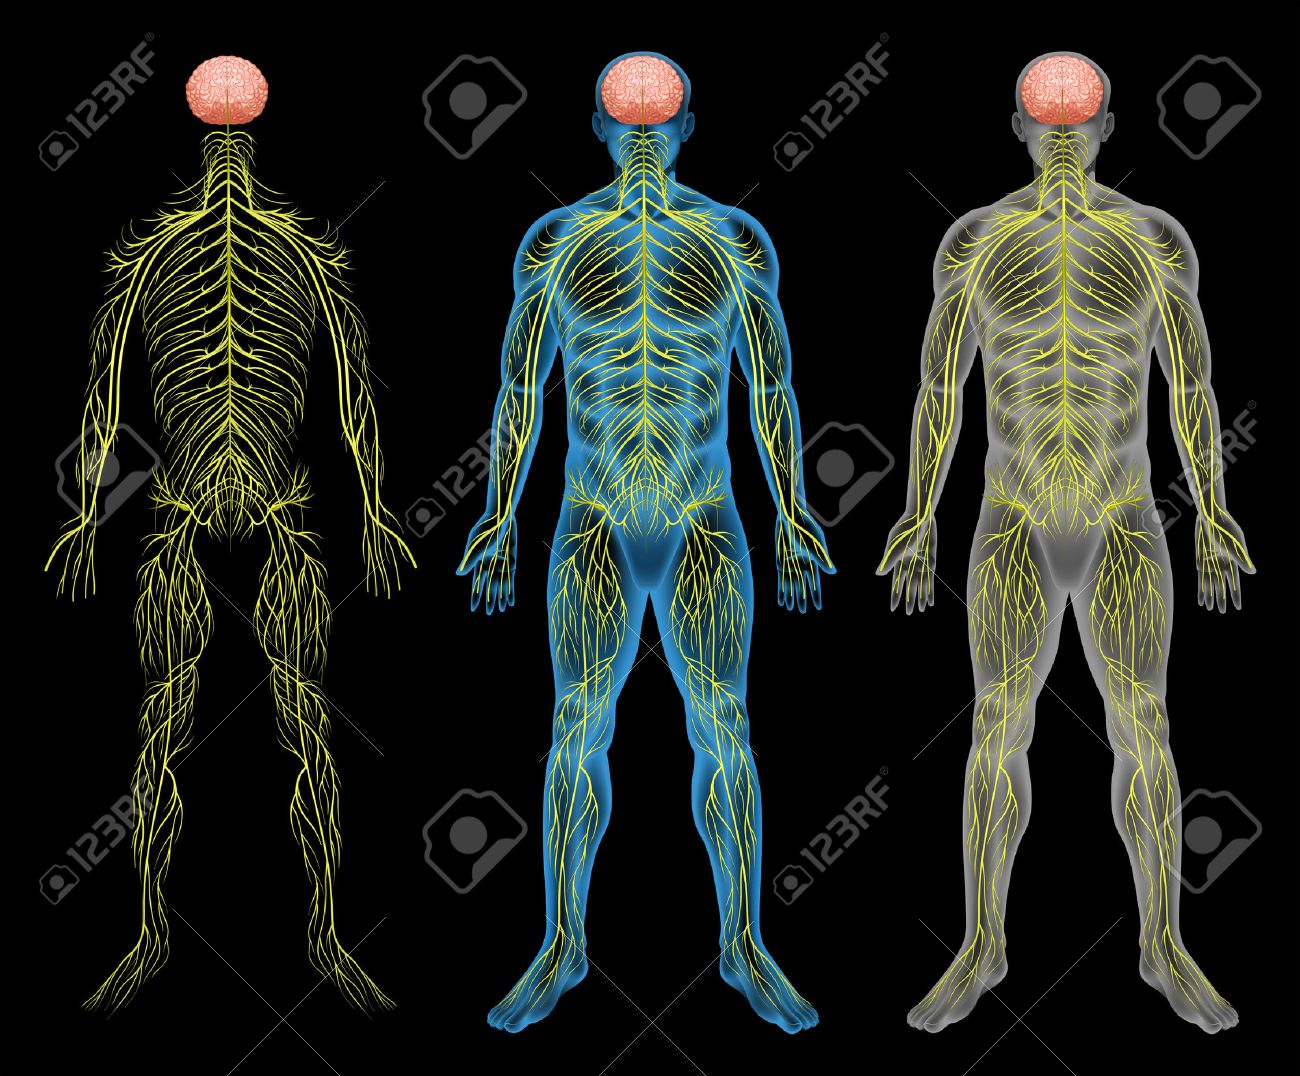 Human Nervous System Stock Photos Royalty Free Human Nervous System